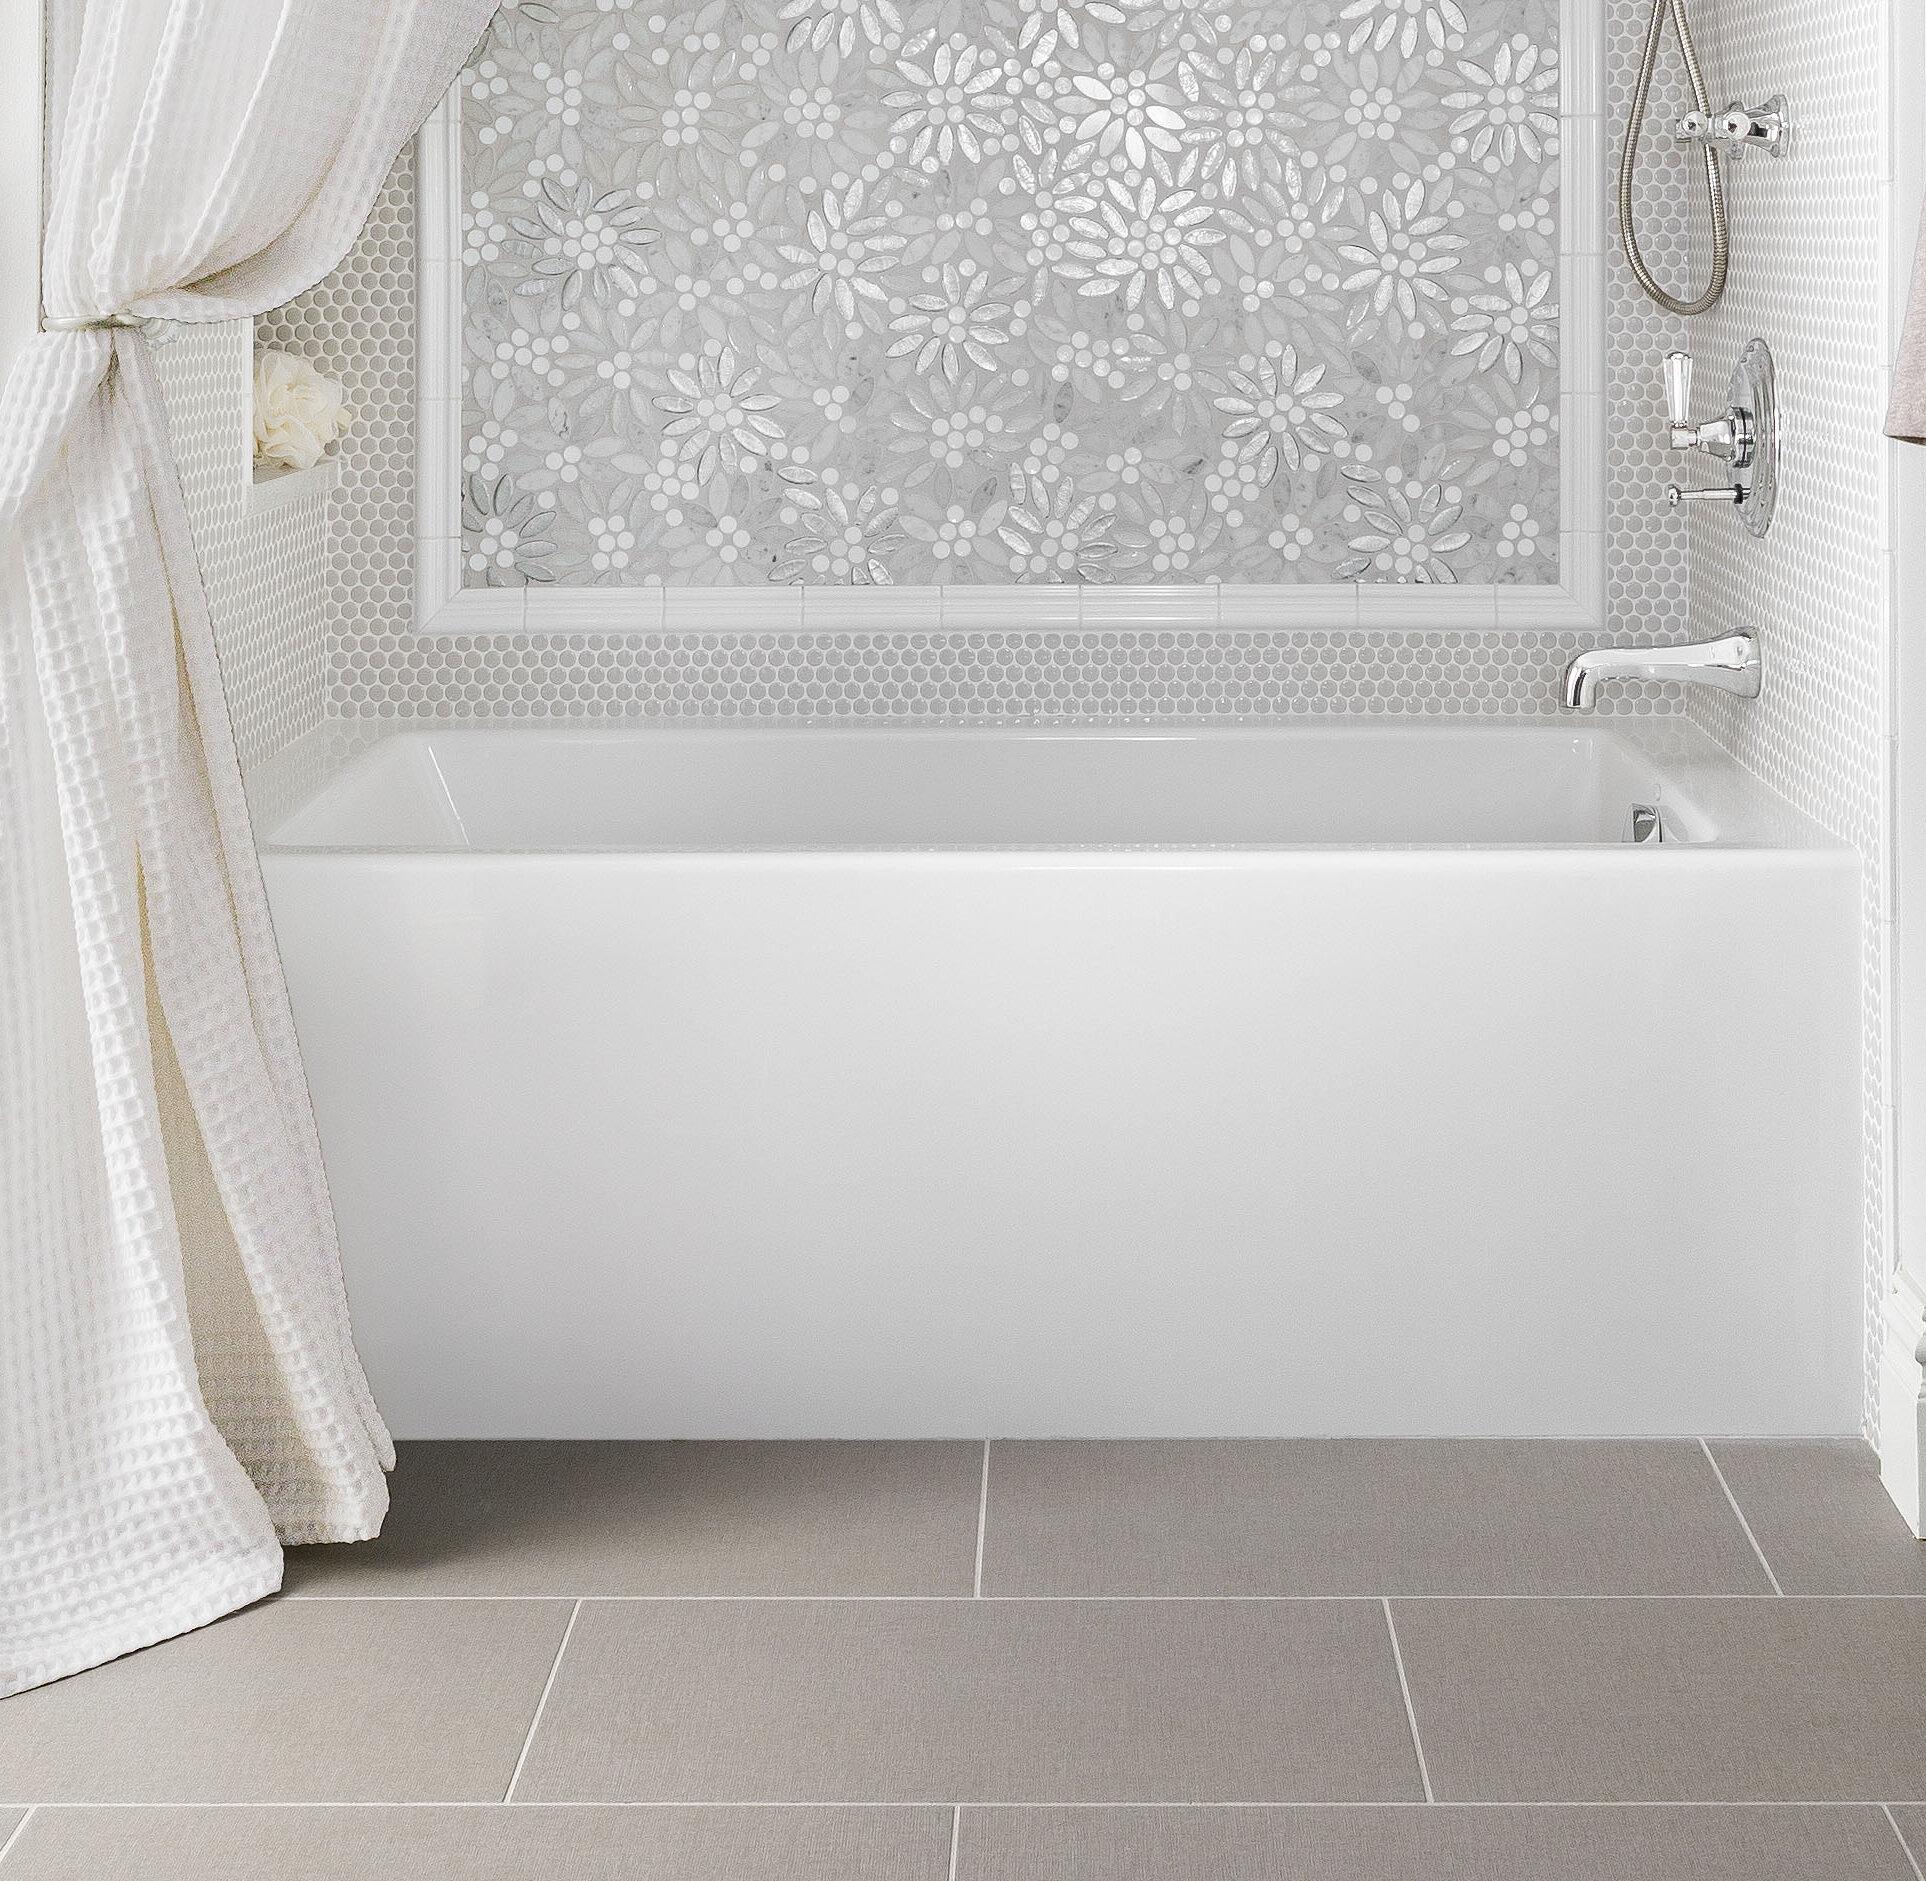 designer 72 x 32 alcove soaking acrylic bathtub